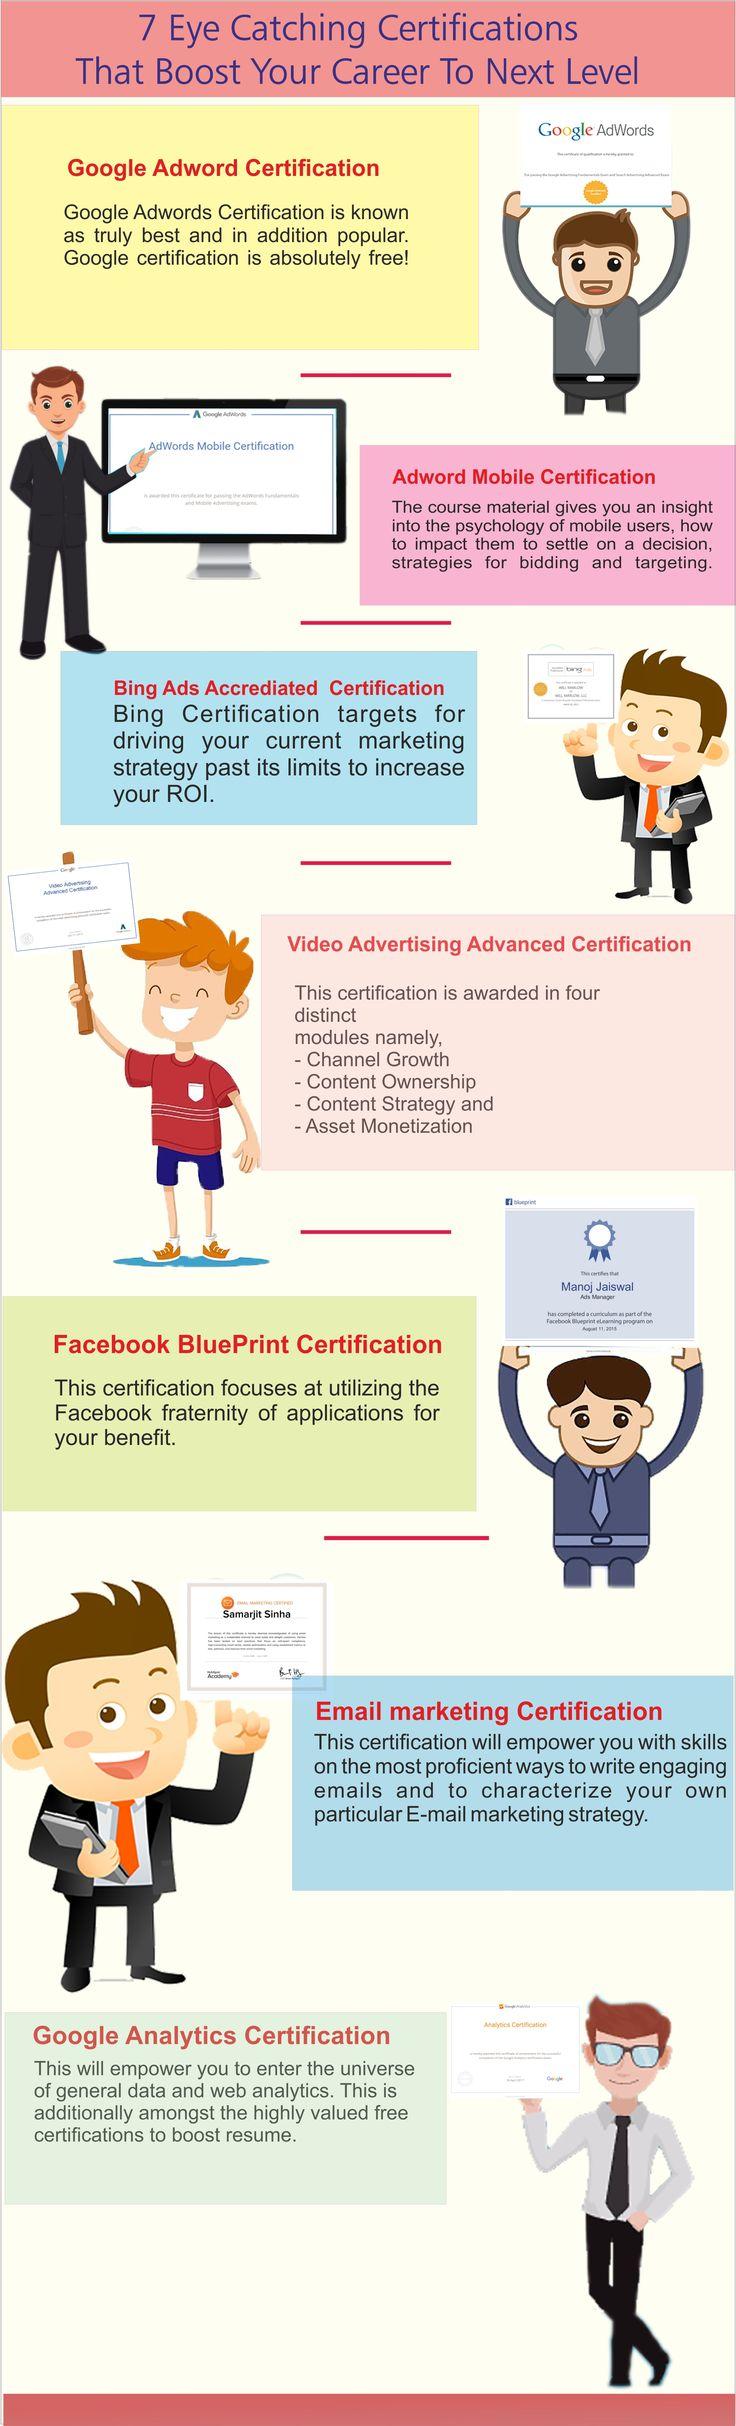 Digital Marketing Certifications Top 7 Eye Catching